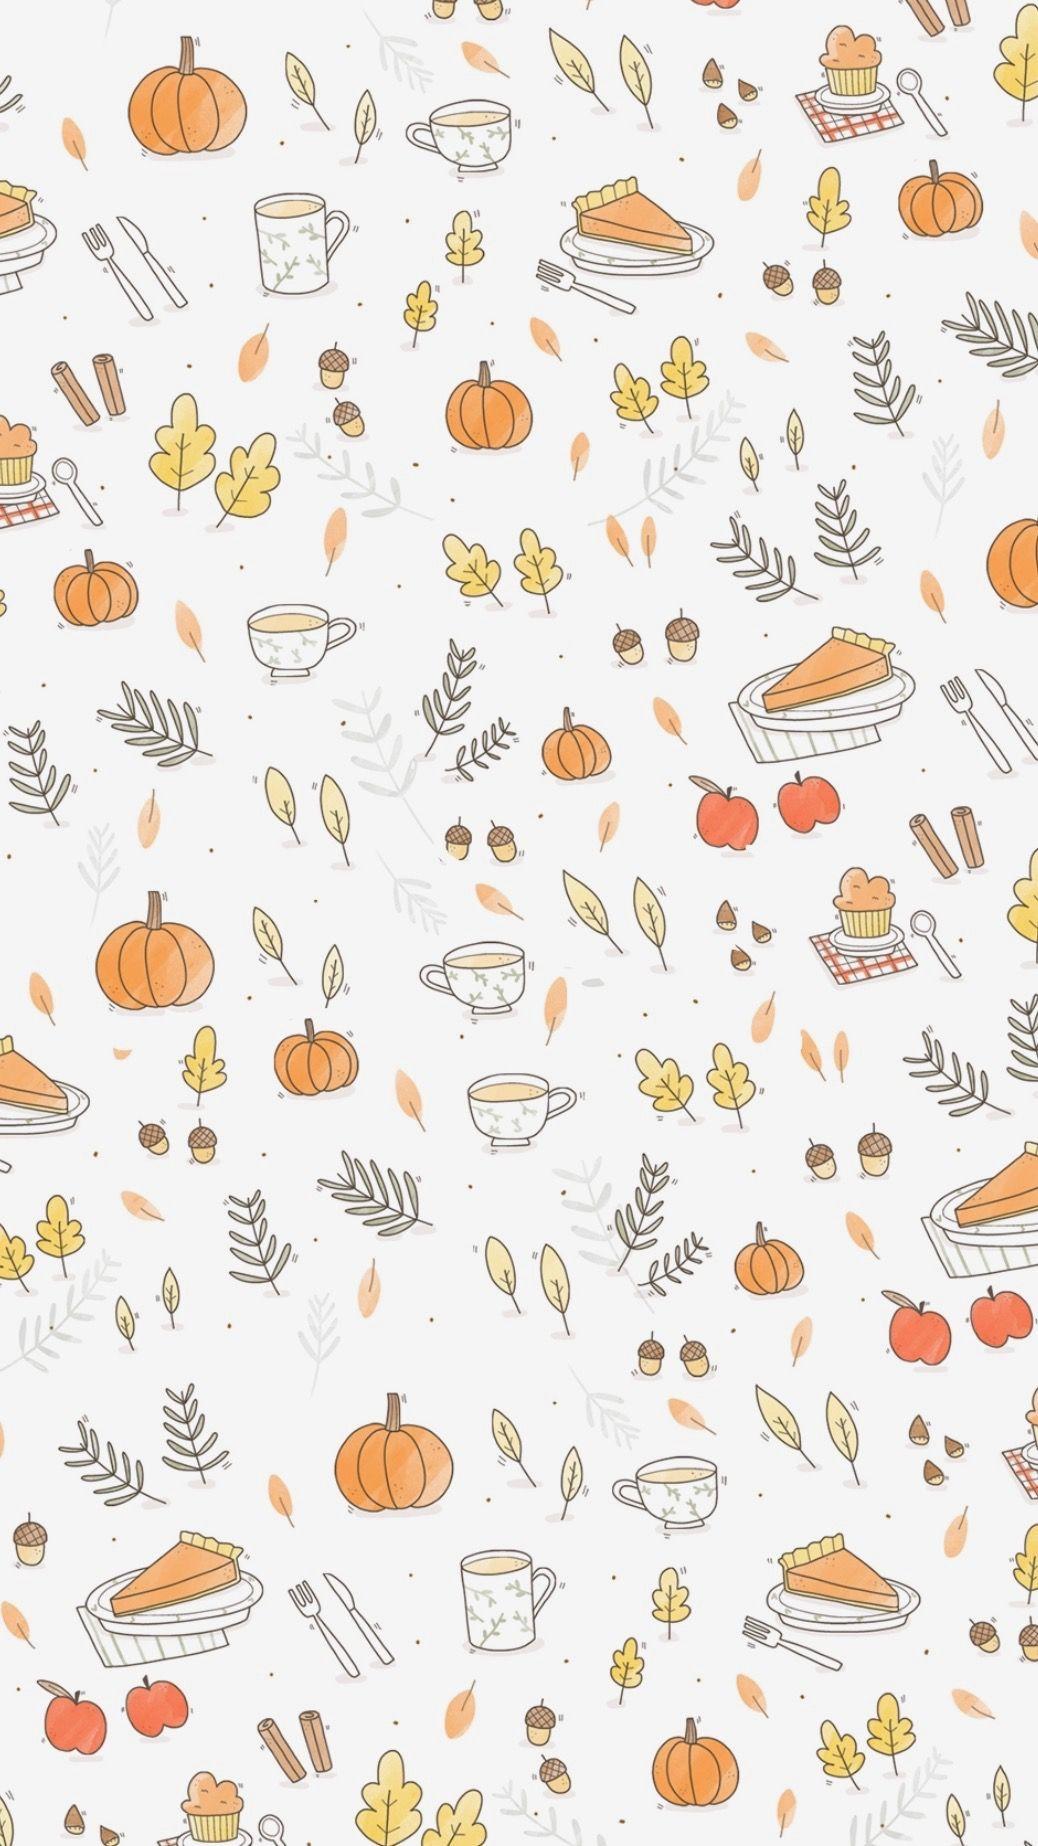 Pin By Madeleinecocina On Autumn Iphone Wallpaper Fall Thanksgiving Wallpaper Cute Fall Wallpaper